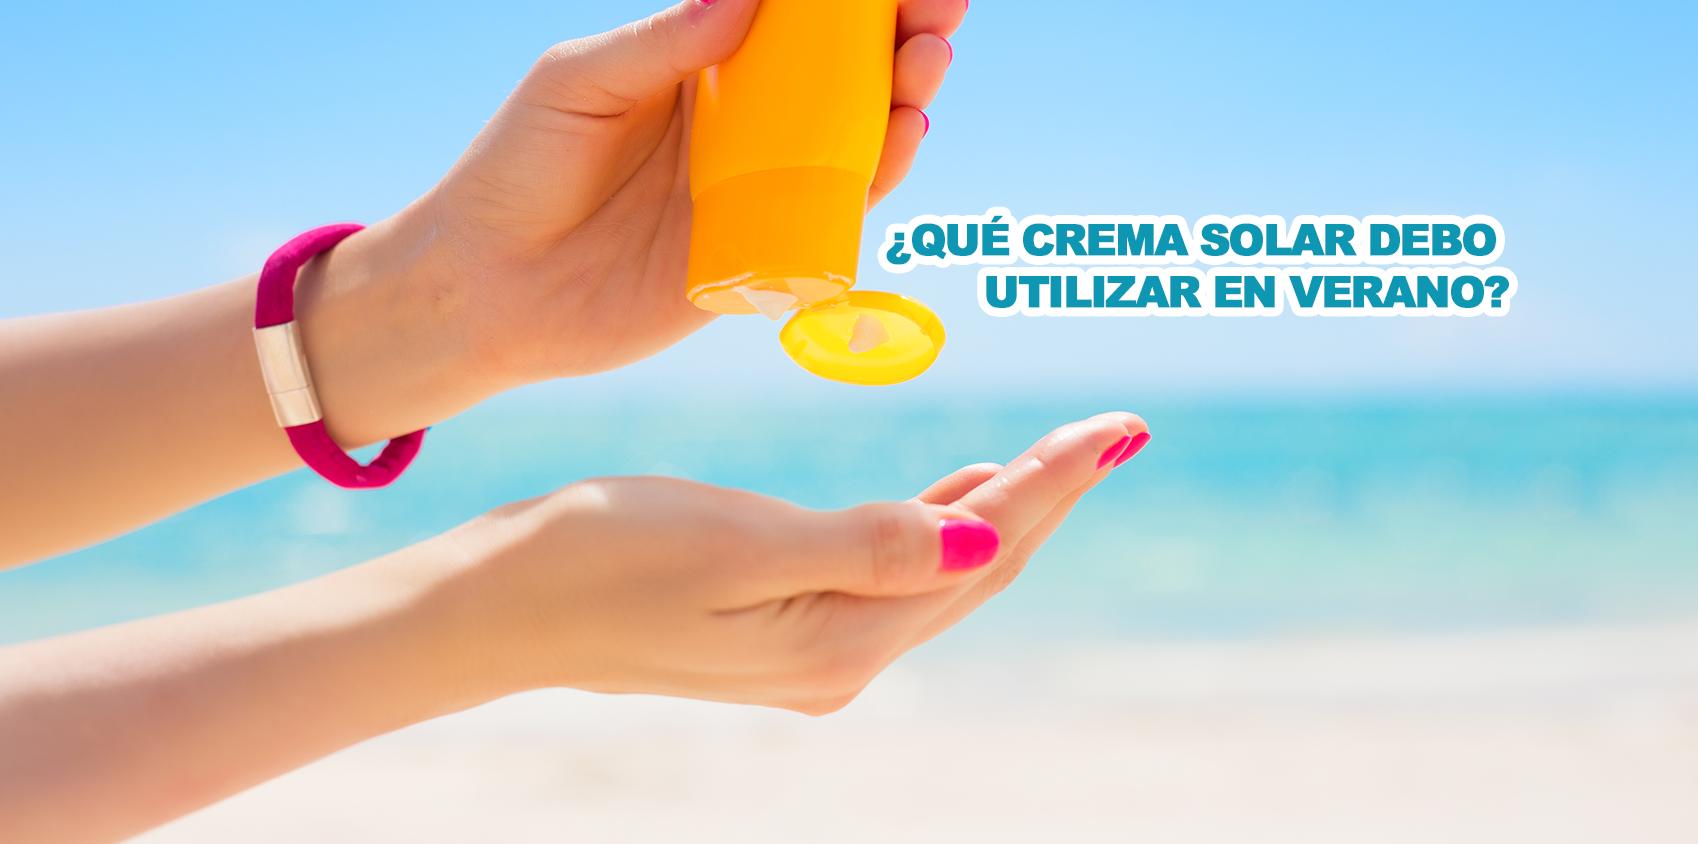 ¿Que crema solar debo usar en Verano?